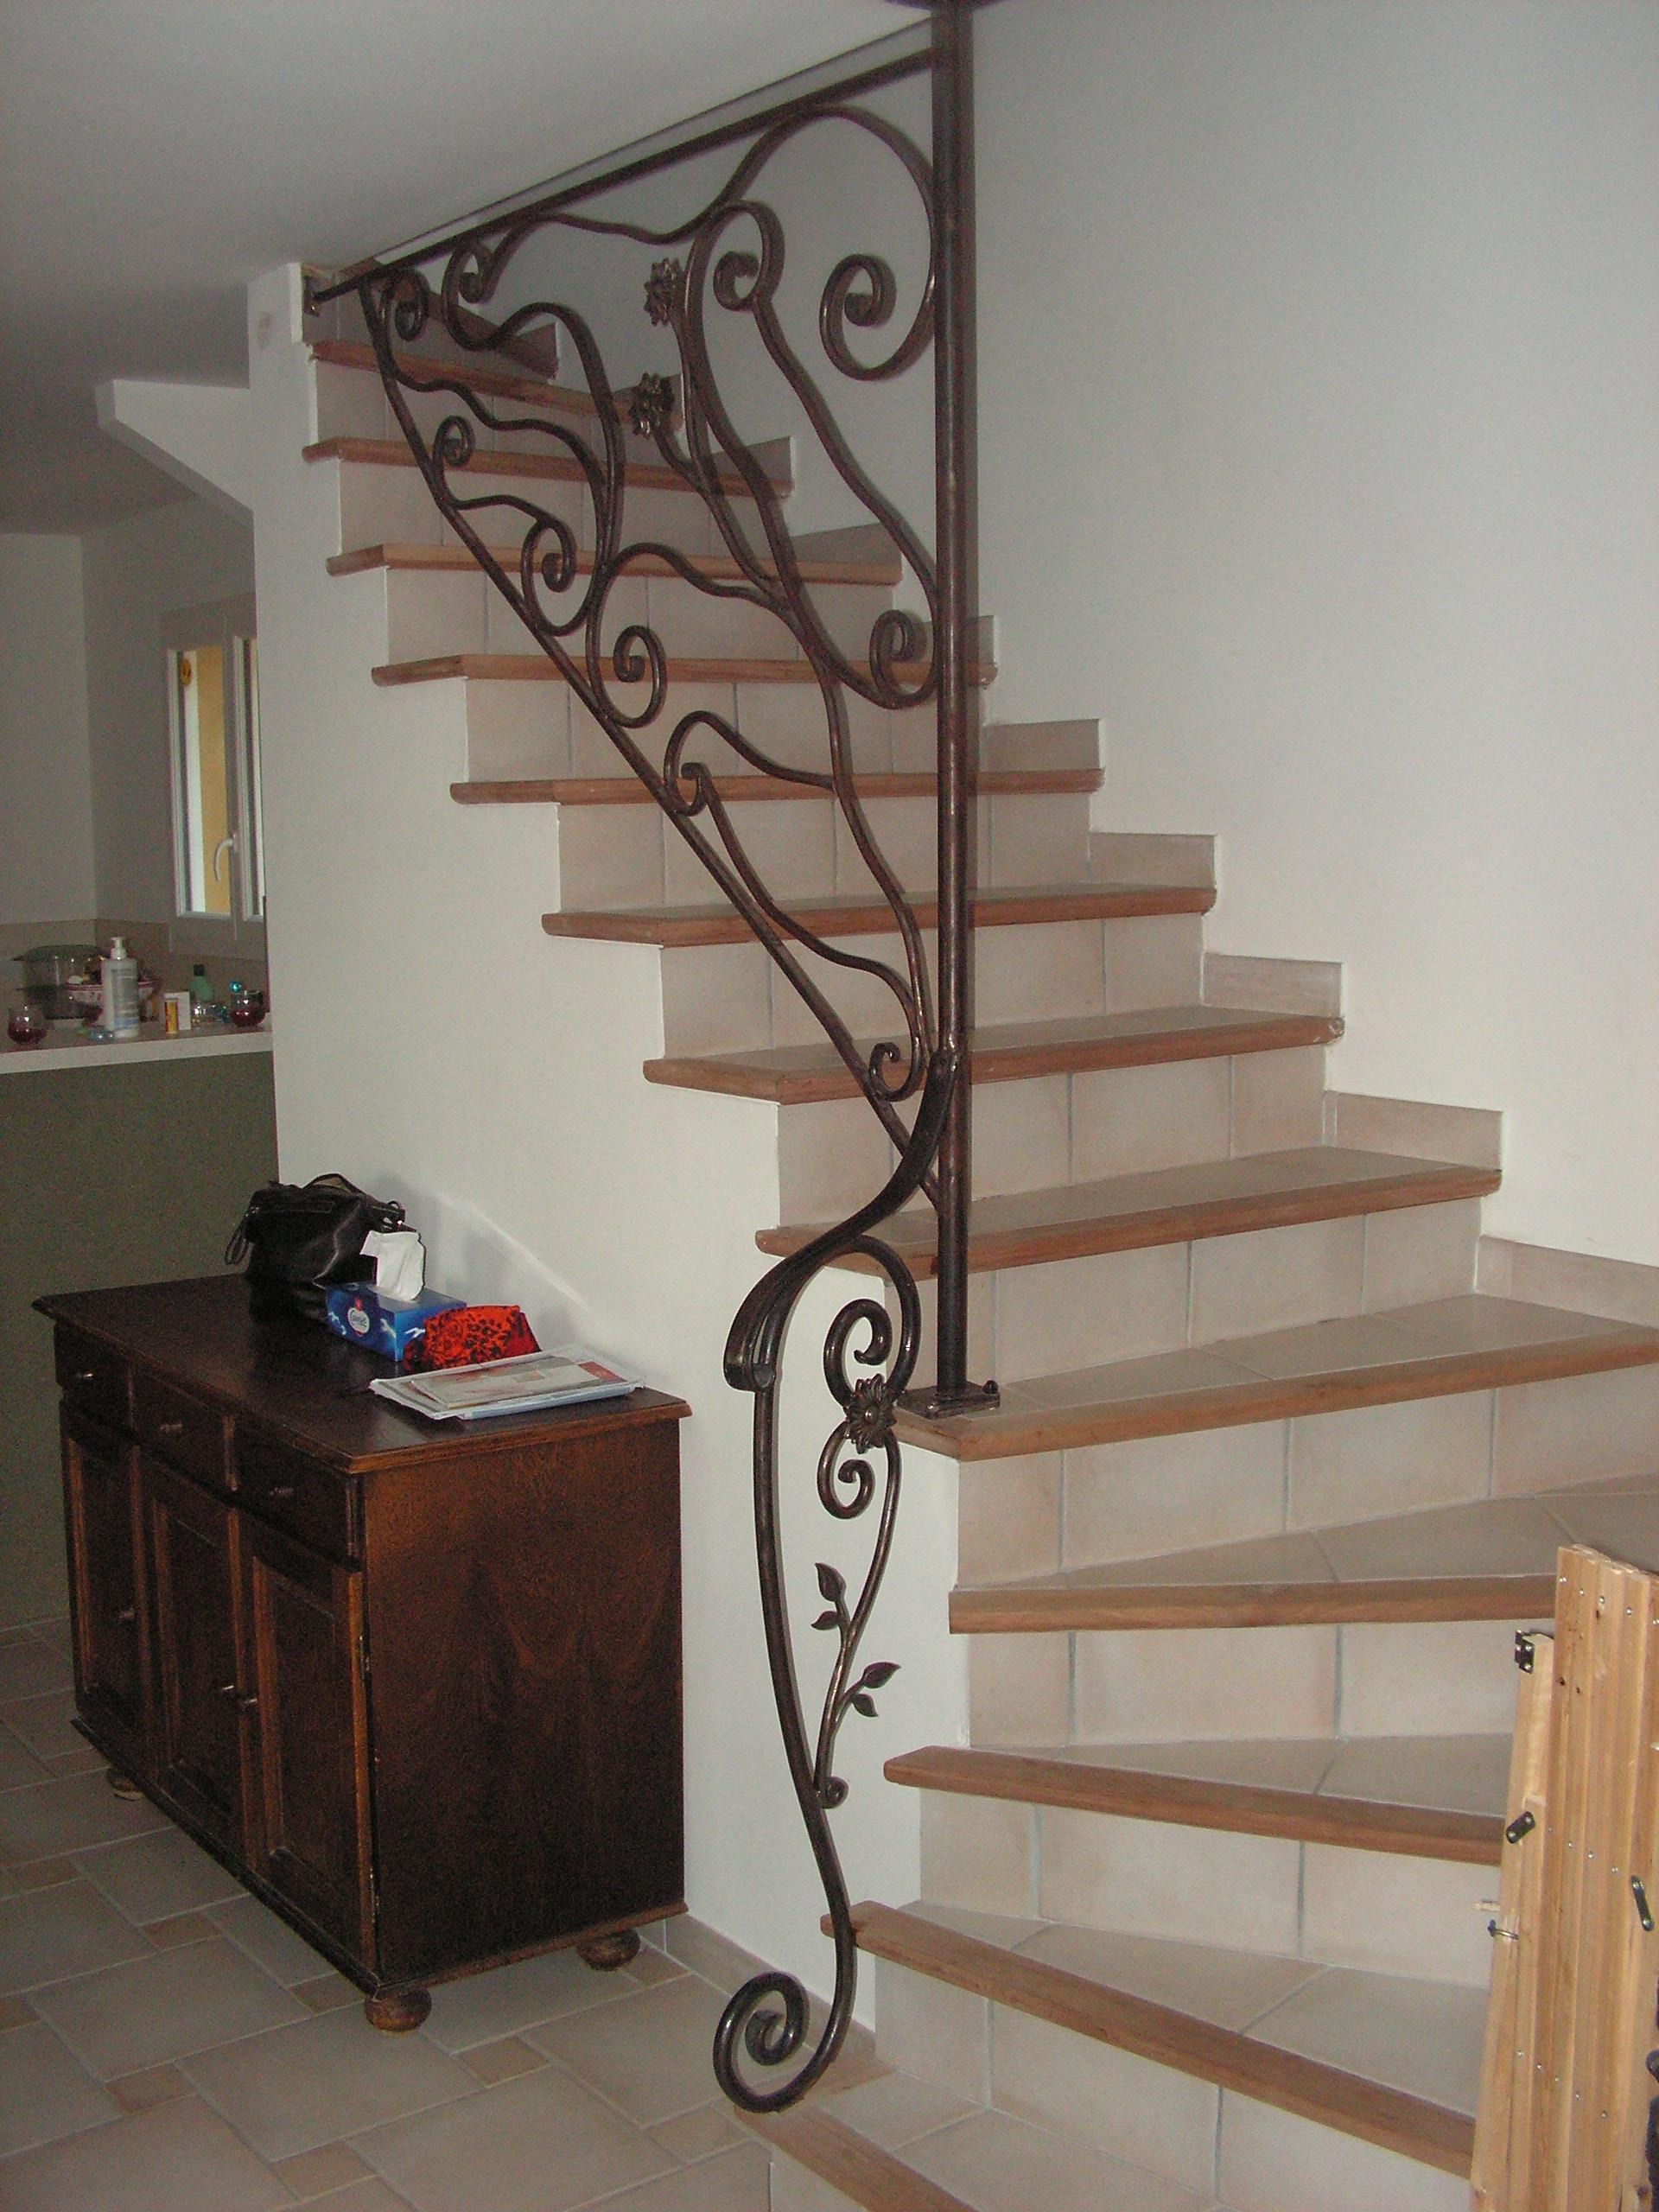 Rampe d escalier int rieur rampe d escalier int rieur - Rampe d escalier moderne ...